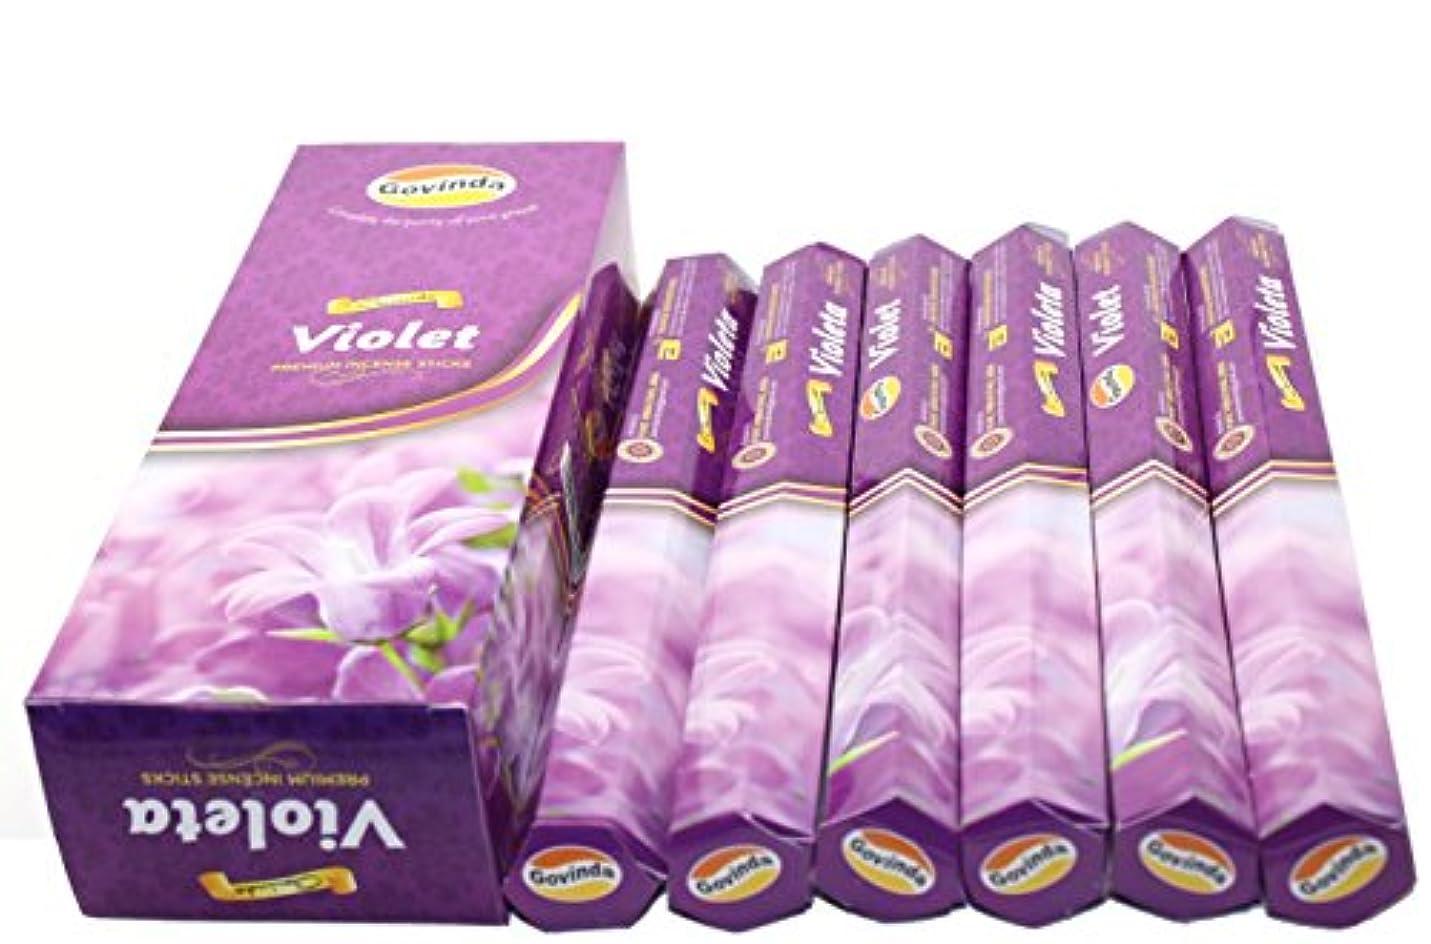 Govinda ® Incense – バイオレット – 120 Incense Sticks、プレミアムIncense、Masalaコーティング